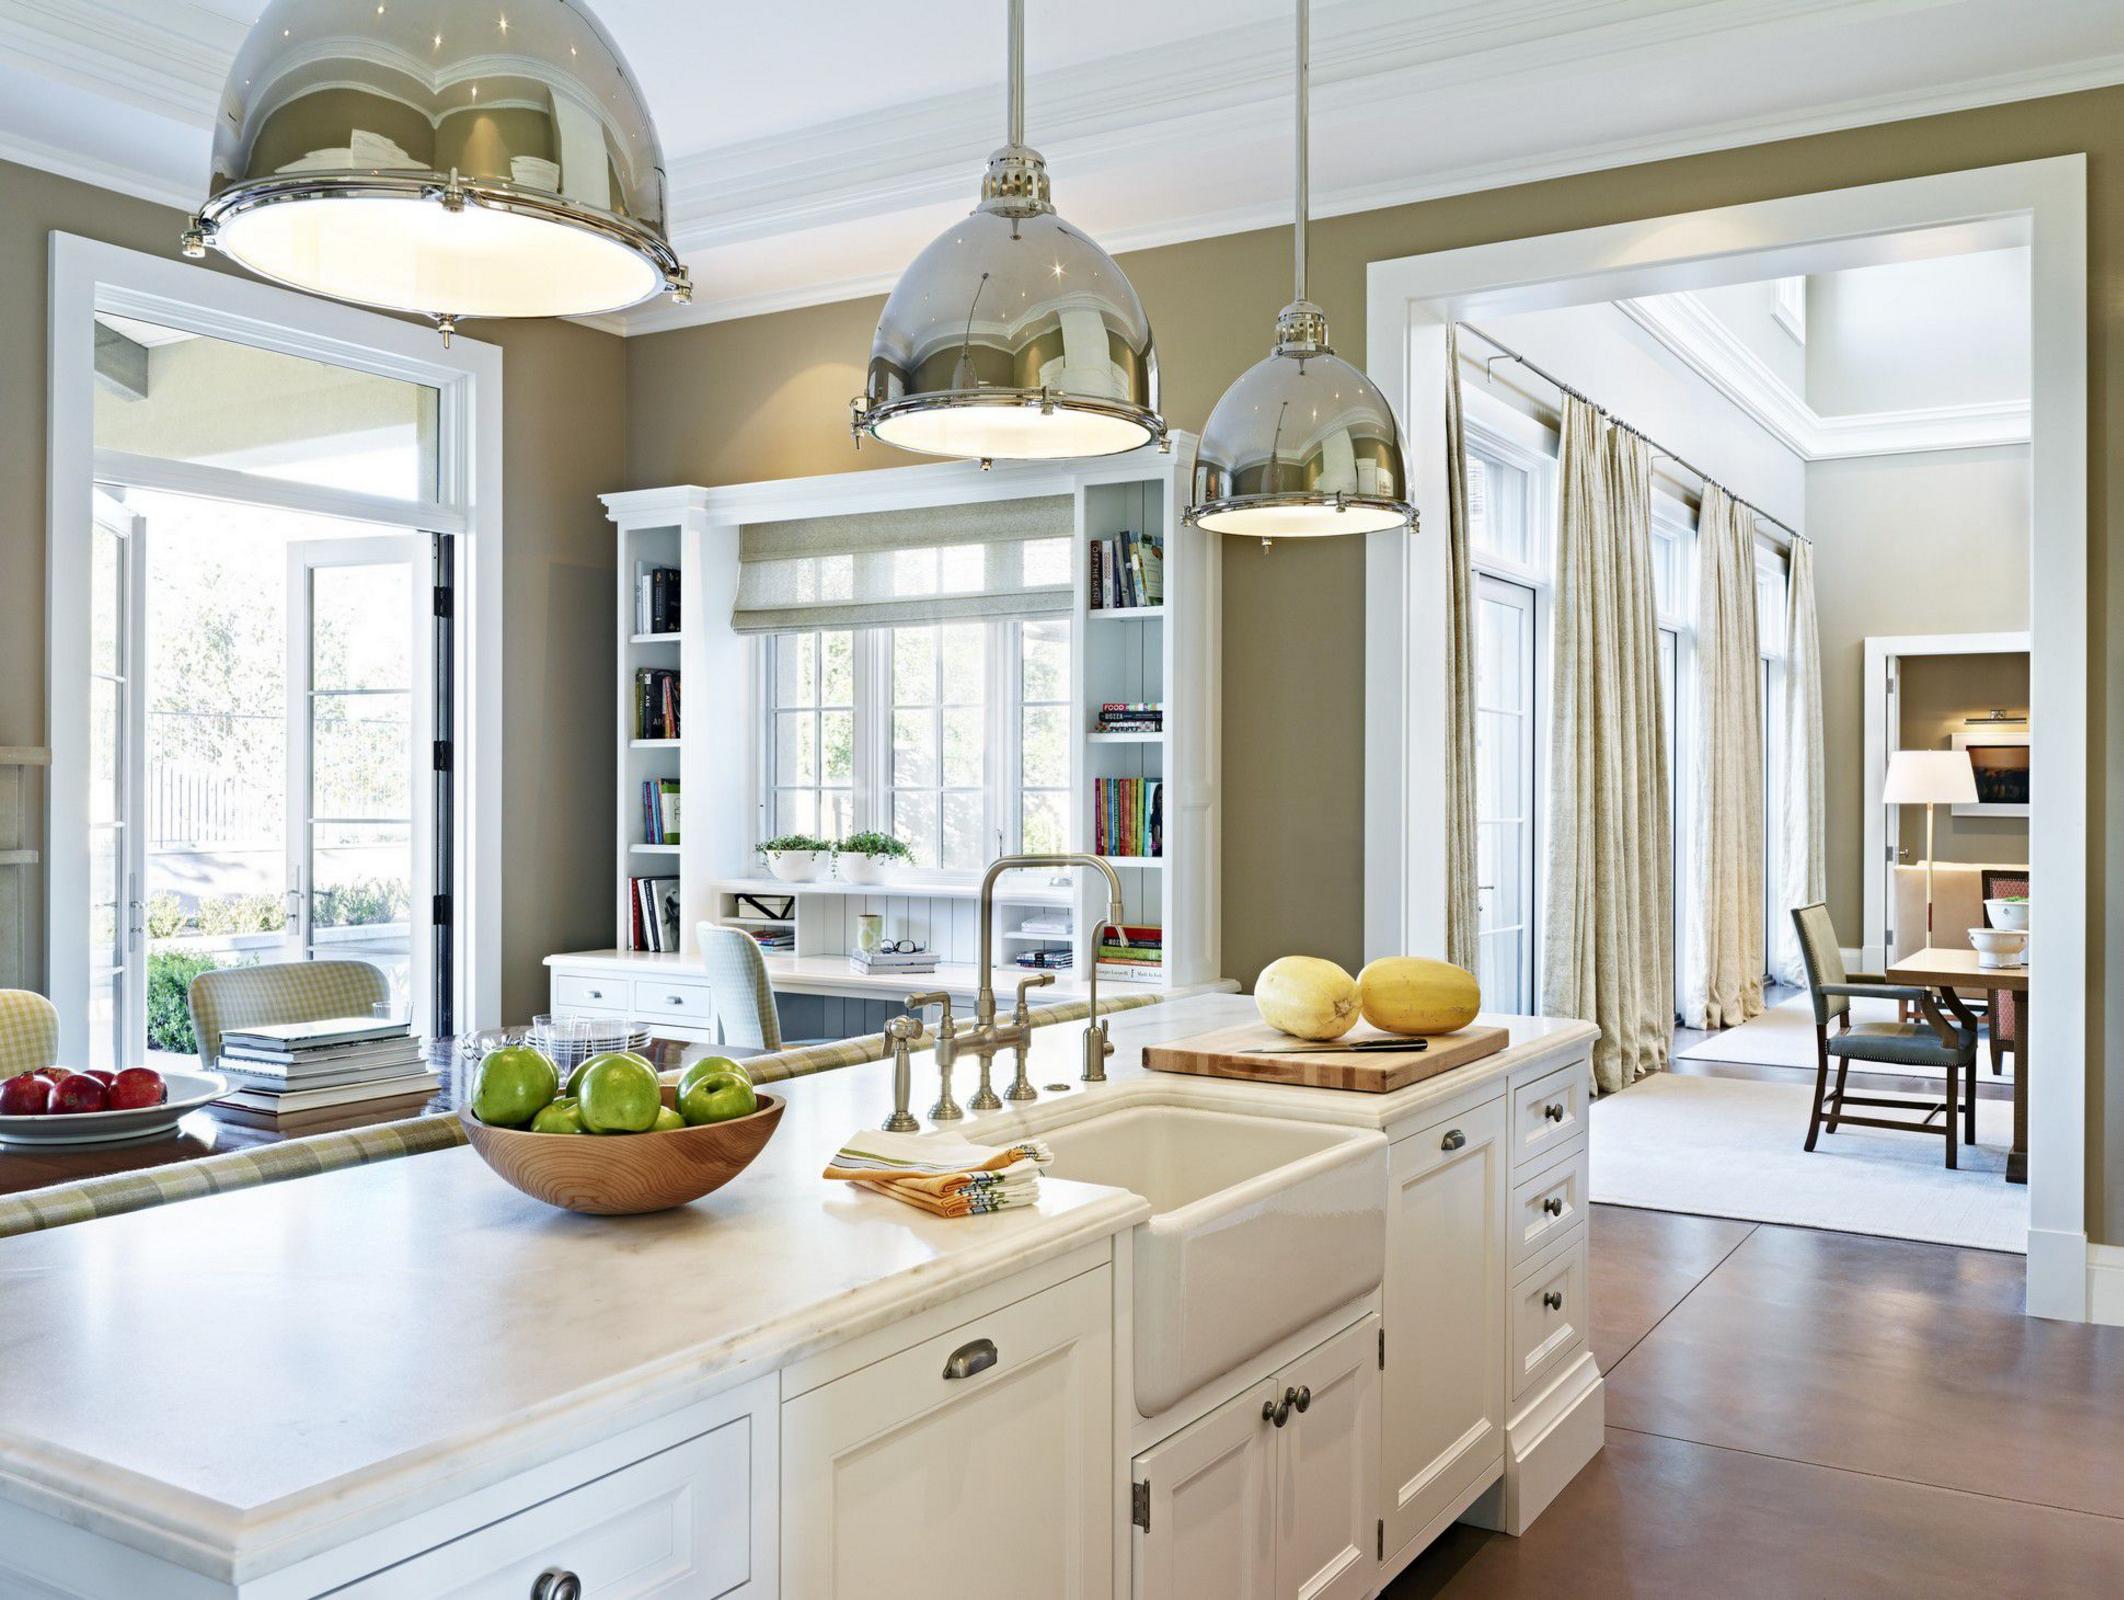 Salcito Custom Homes Luxe Interiors Design Home Kitchens Dwell Kitchen Kitchen Design Decor